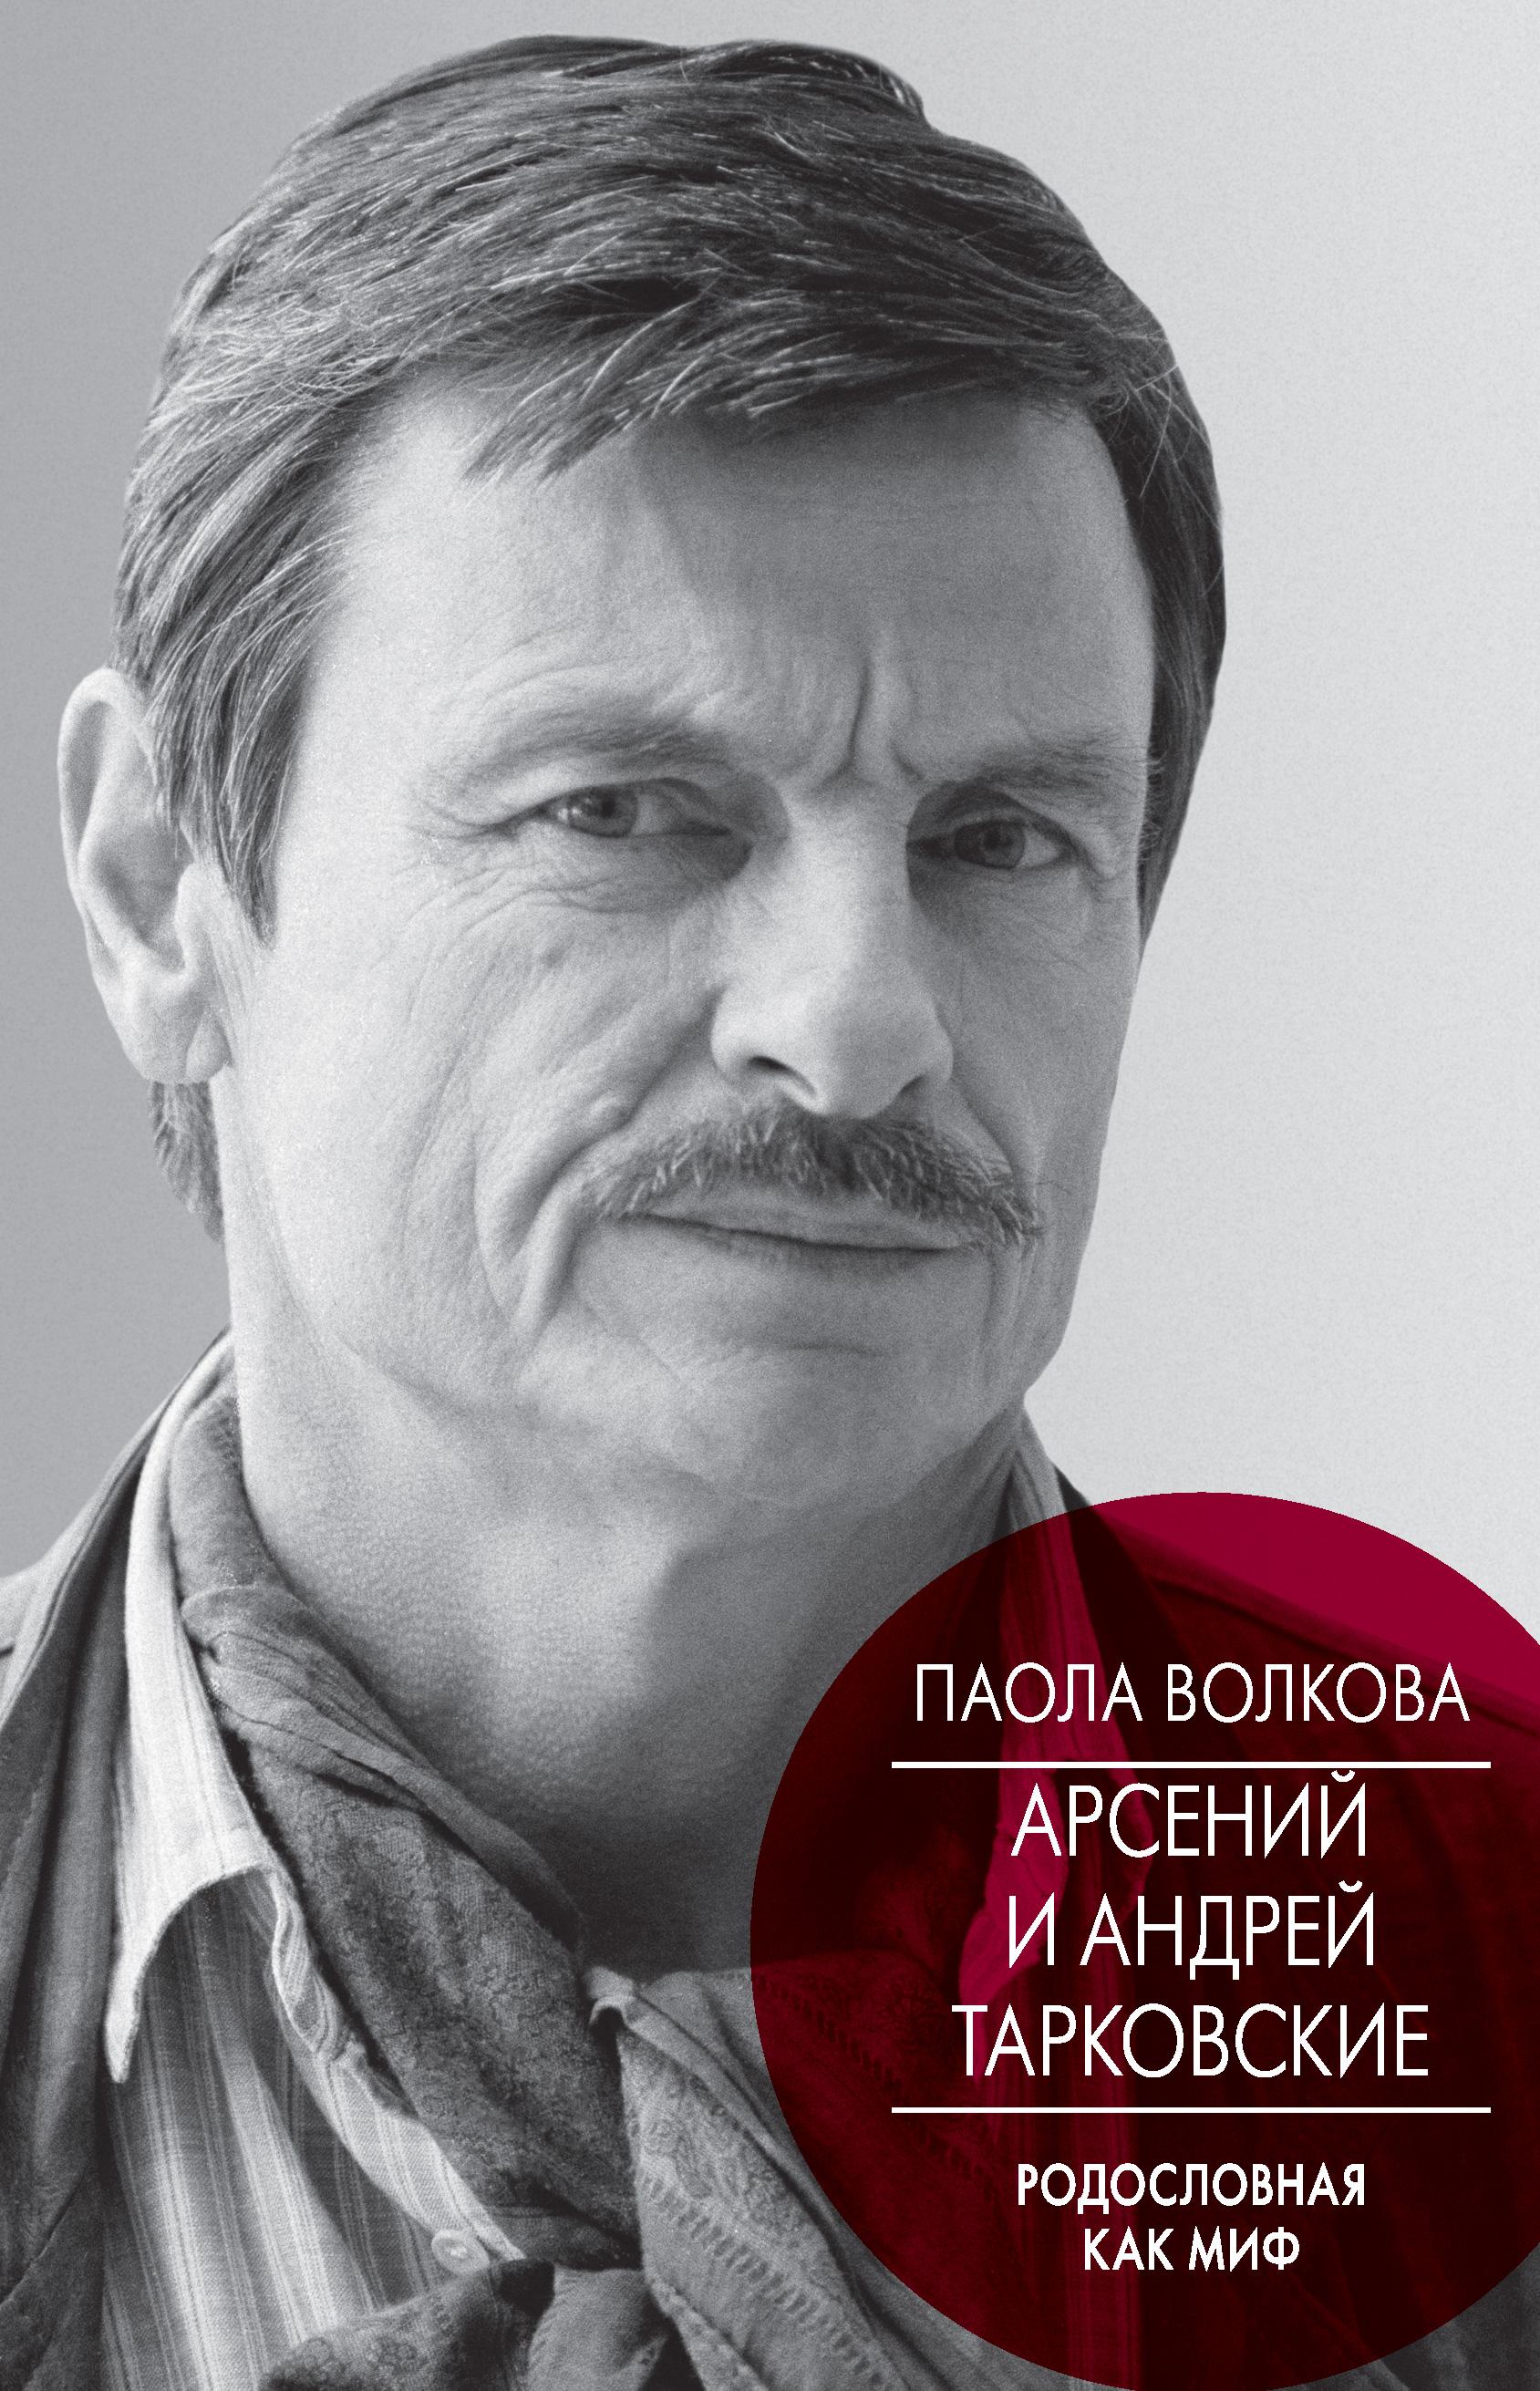 Арсений и Андрей Тарковские. Родословная как миф